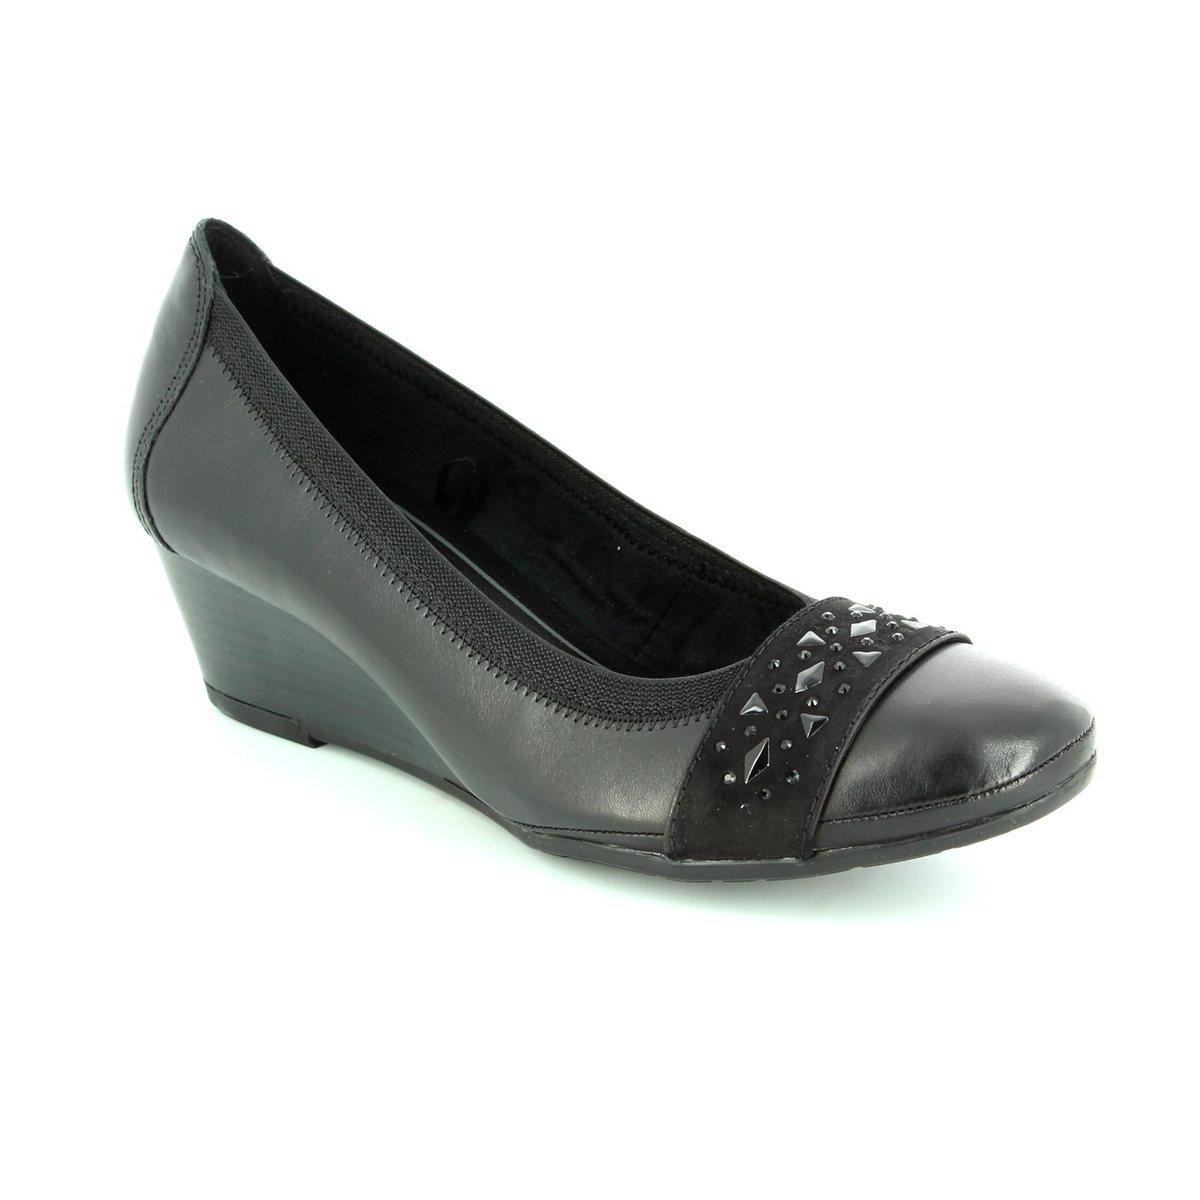 marco tozzi rancasta 22303 096 black heeled shoes. Black Bedroom Furniture Sets. Home Design Ideas